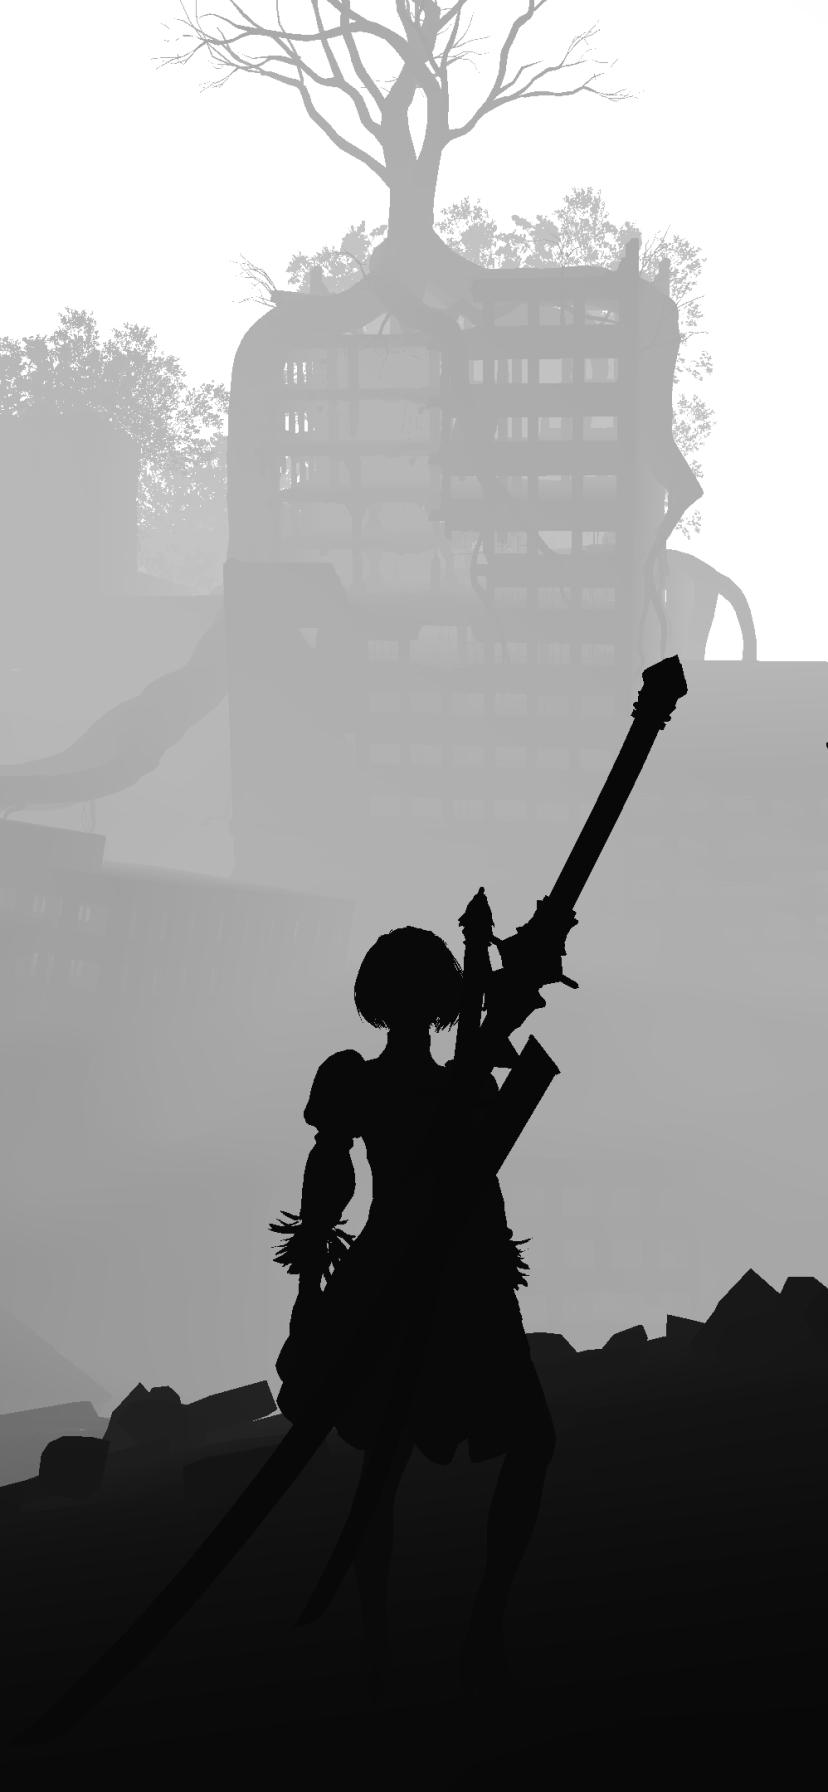 NieR: Automata game mobile wallpaper